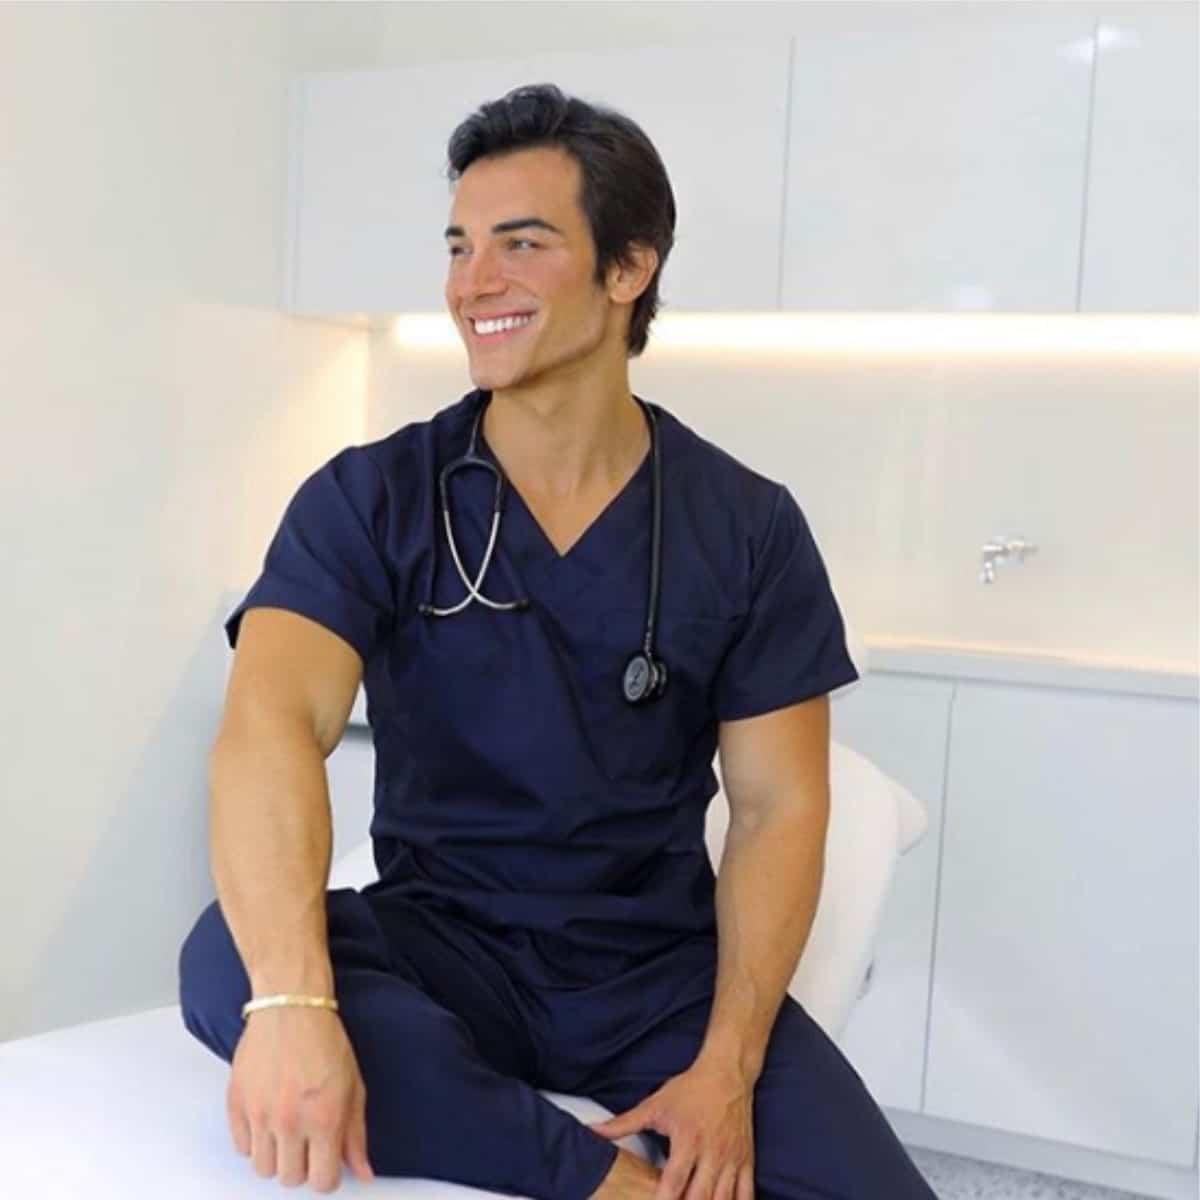 berlino-casacca-dentista-vendita-online